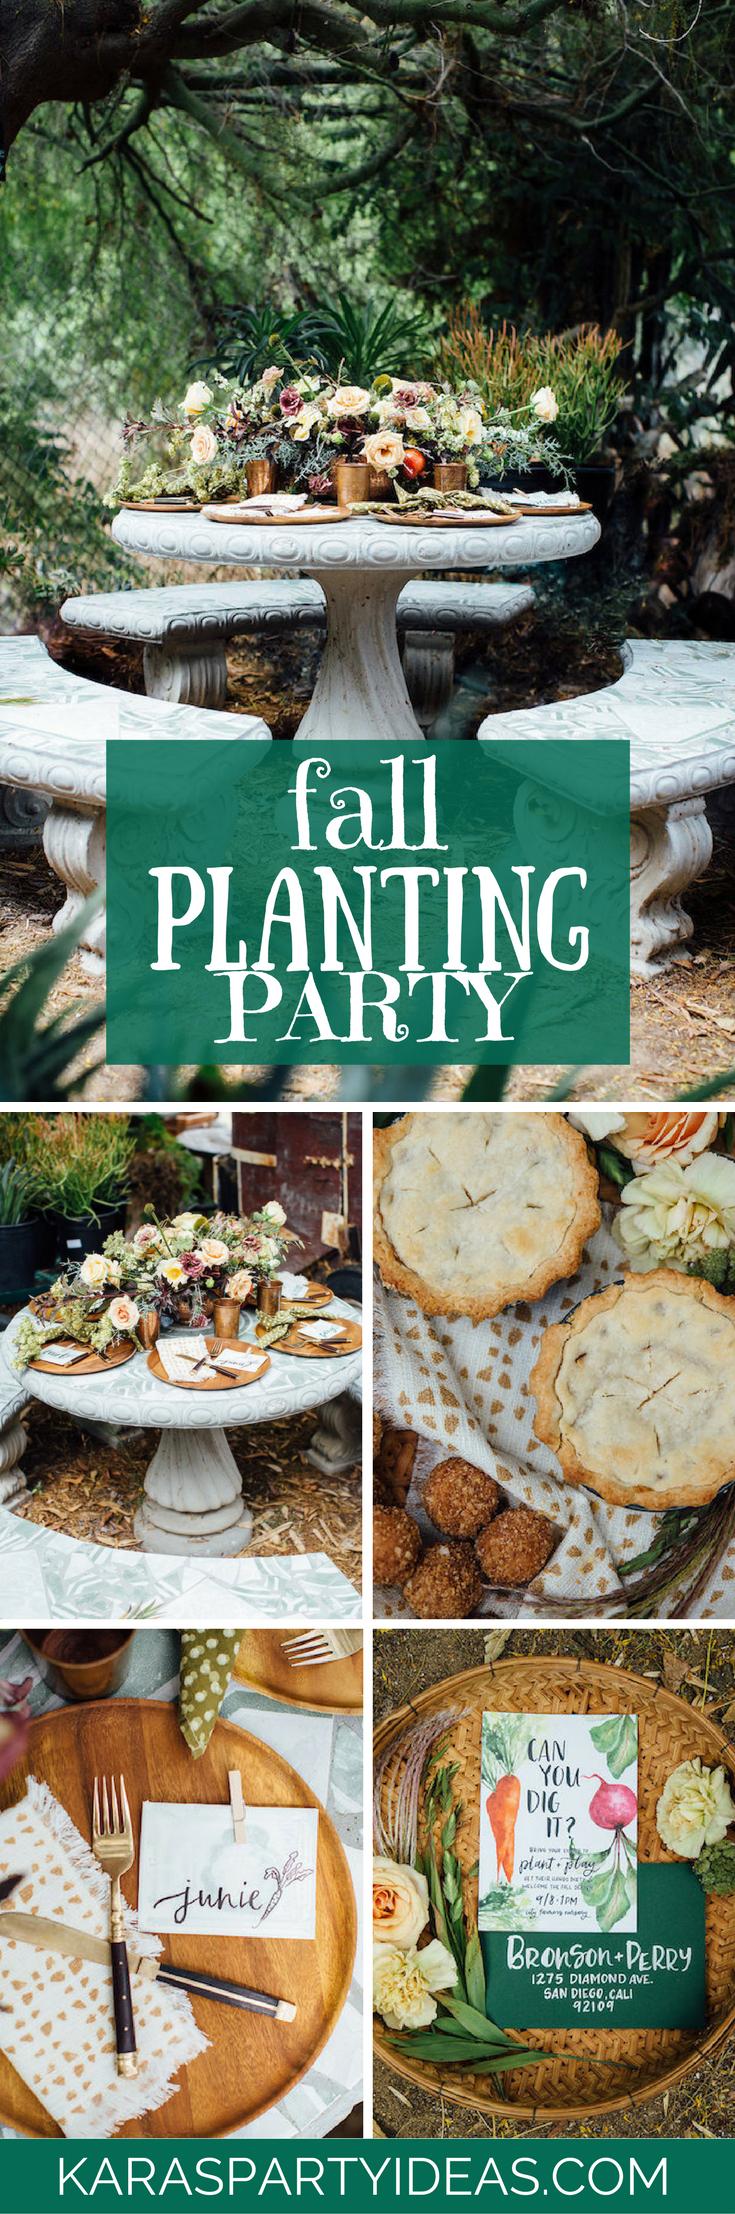 Fall Planting Party via Kara's Party Ideas - KarasPartyIdeas.com